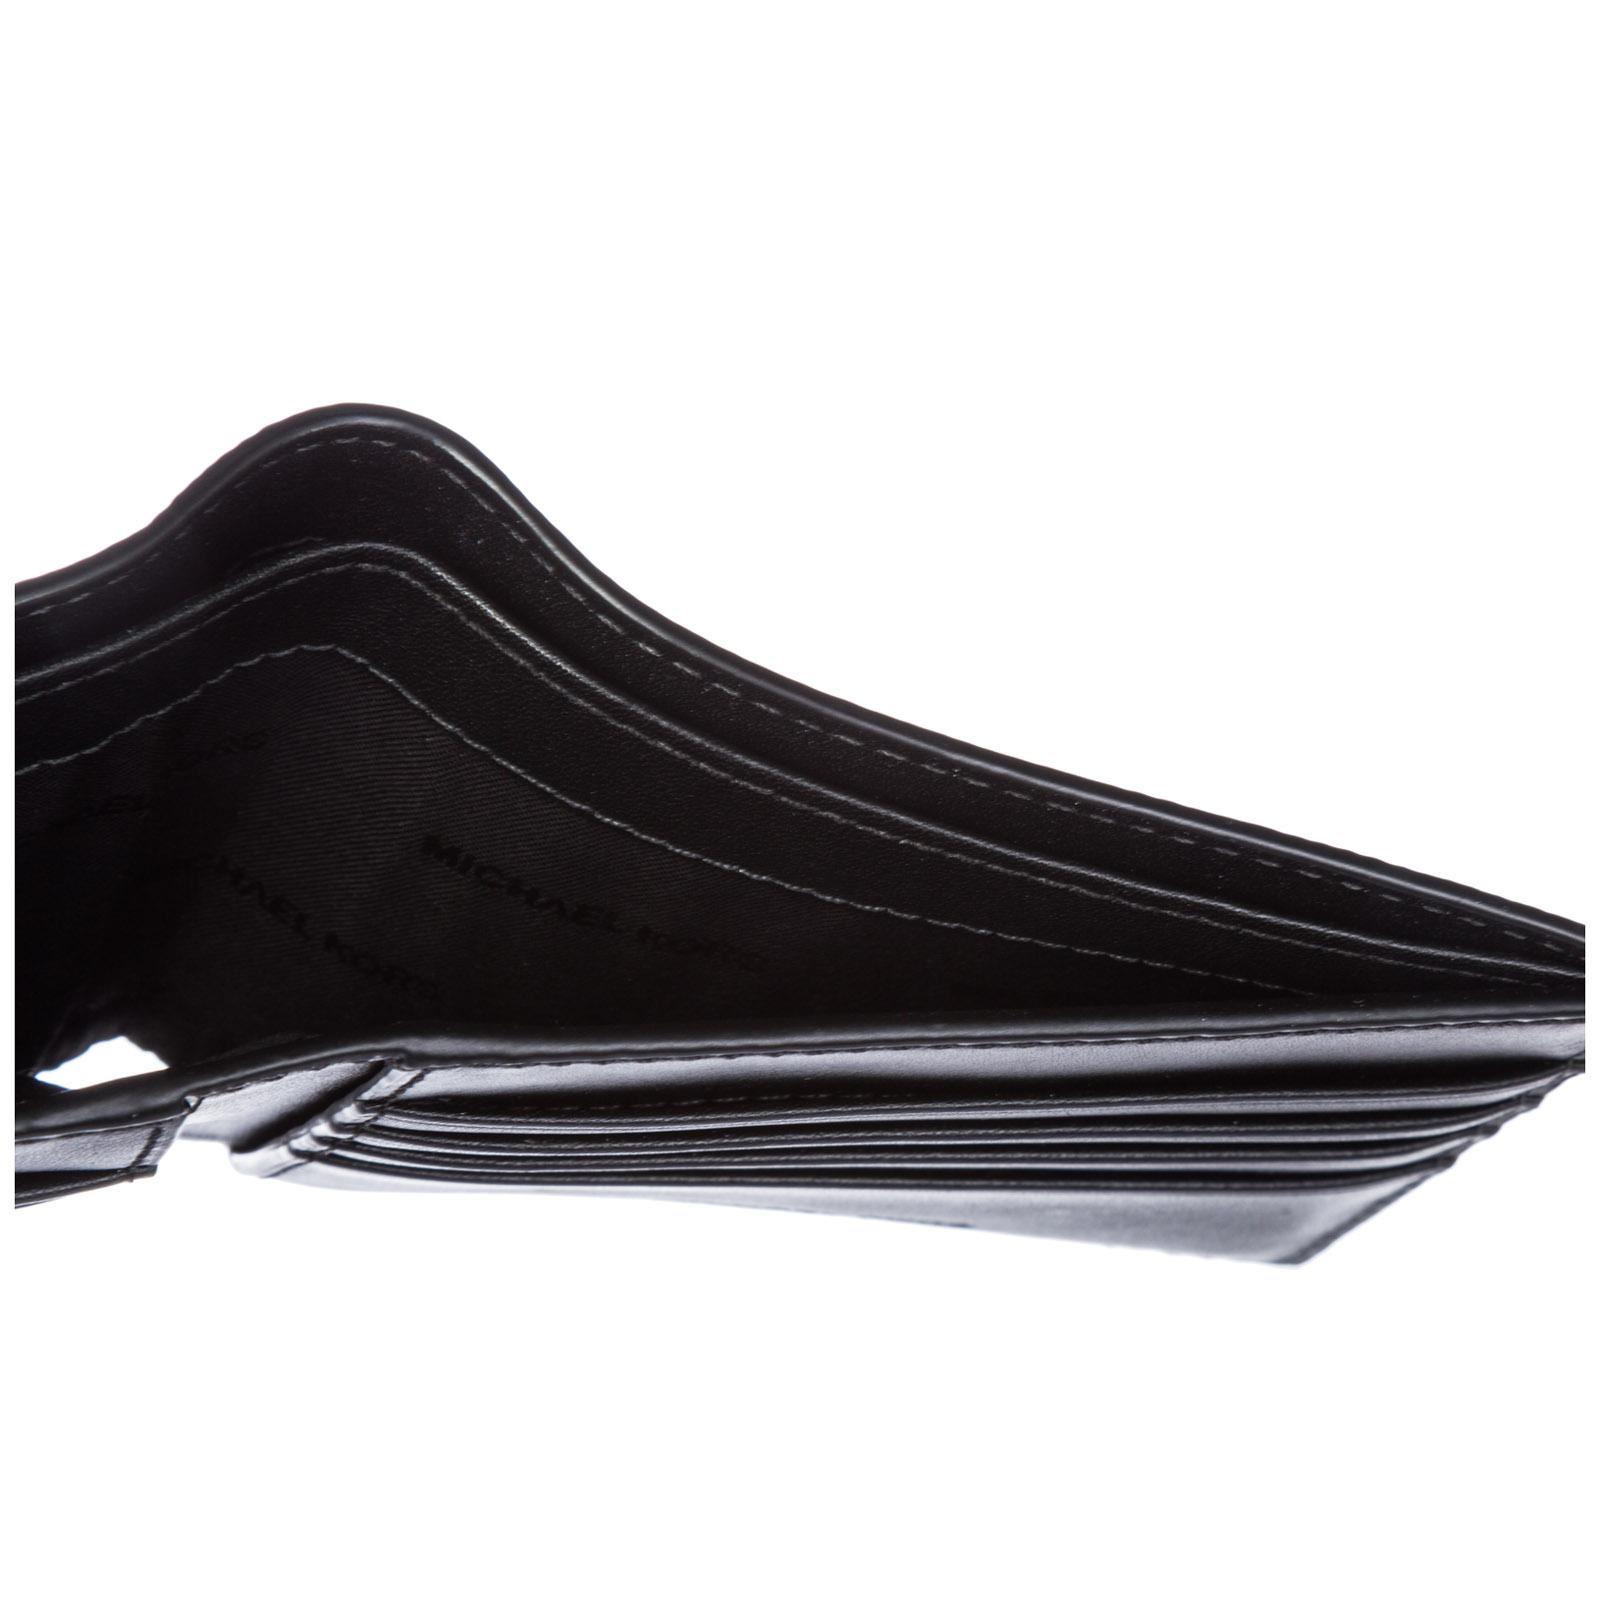 Men's genuine leather wallet credit card bifold bifold  harrison